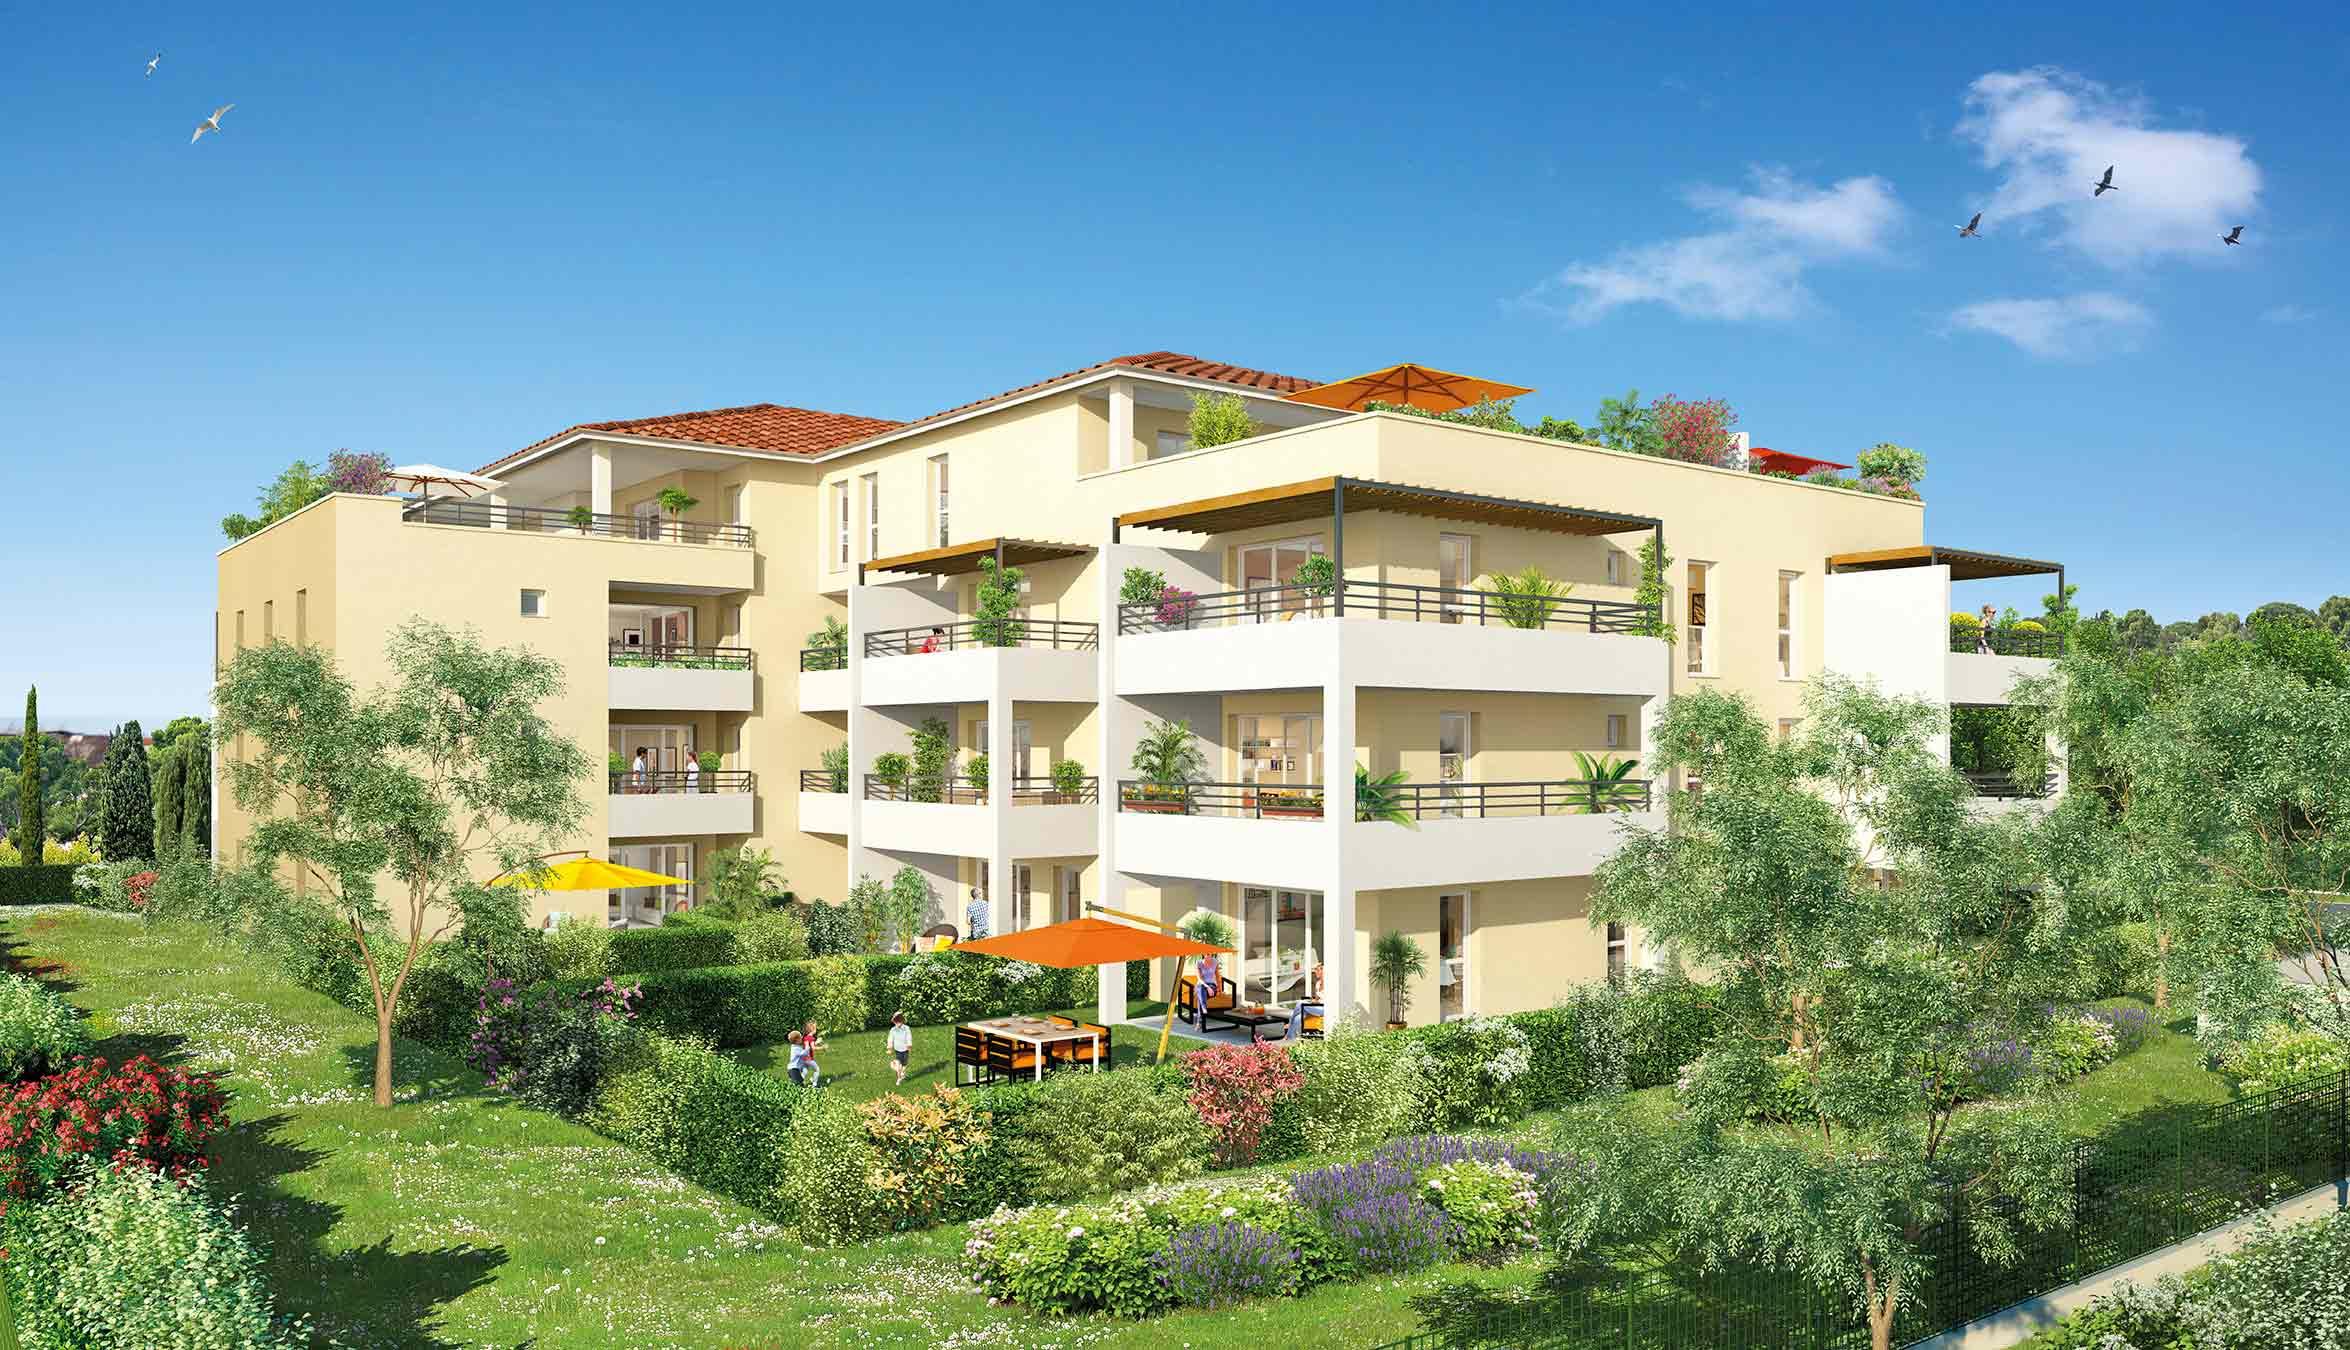 Programme immobilier Montpellier : un investissement rentable